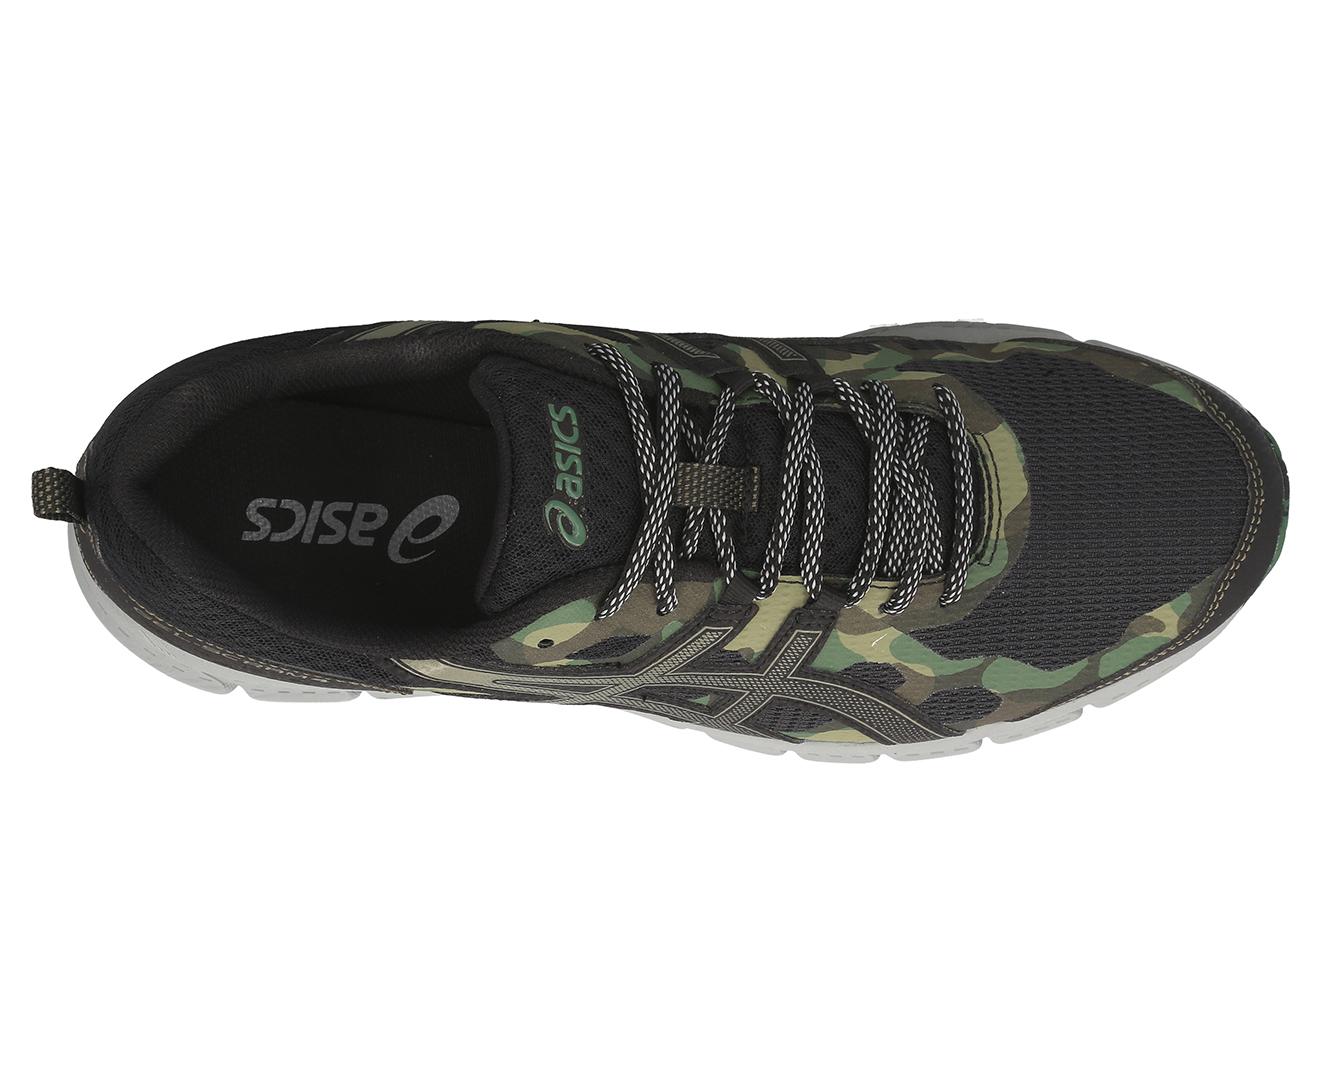 ASICS Men's GEL Scram 4 Trail Running Sports Shoes BlackIrvine